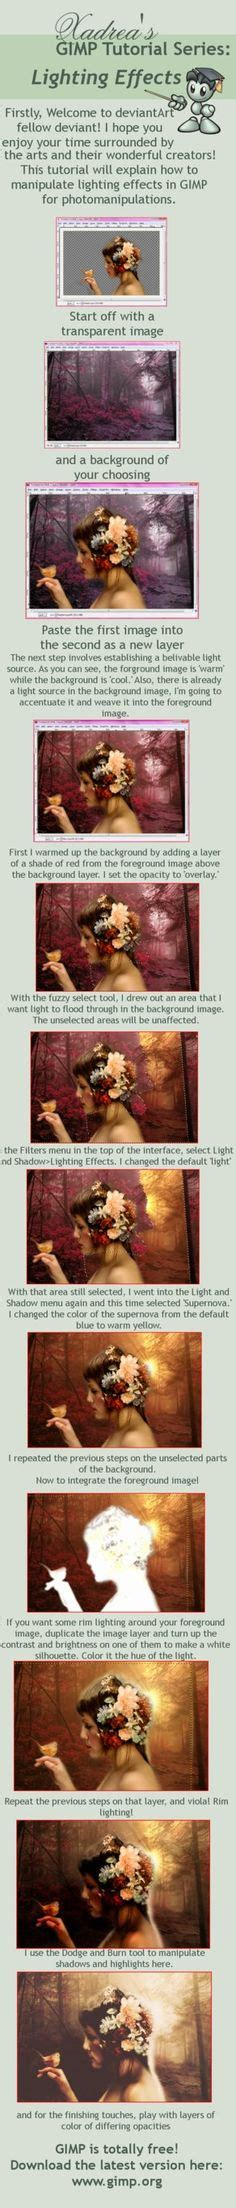 newsprint effect basics gimp by tgfcoder on deviantart eye coloring tutorial on gimp by evolved monkey deviantart